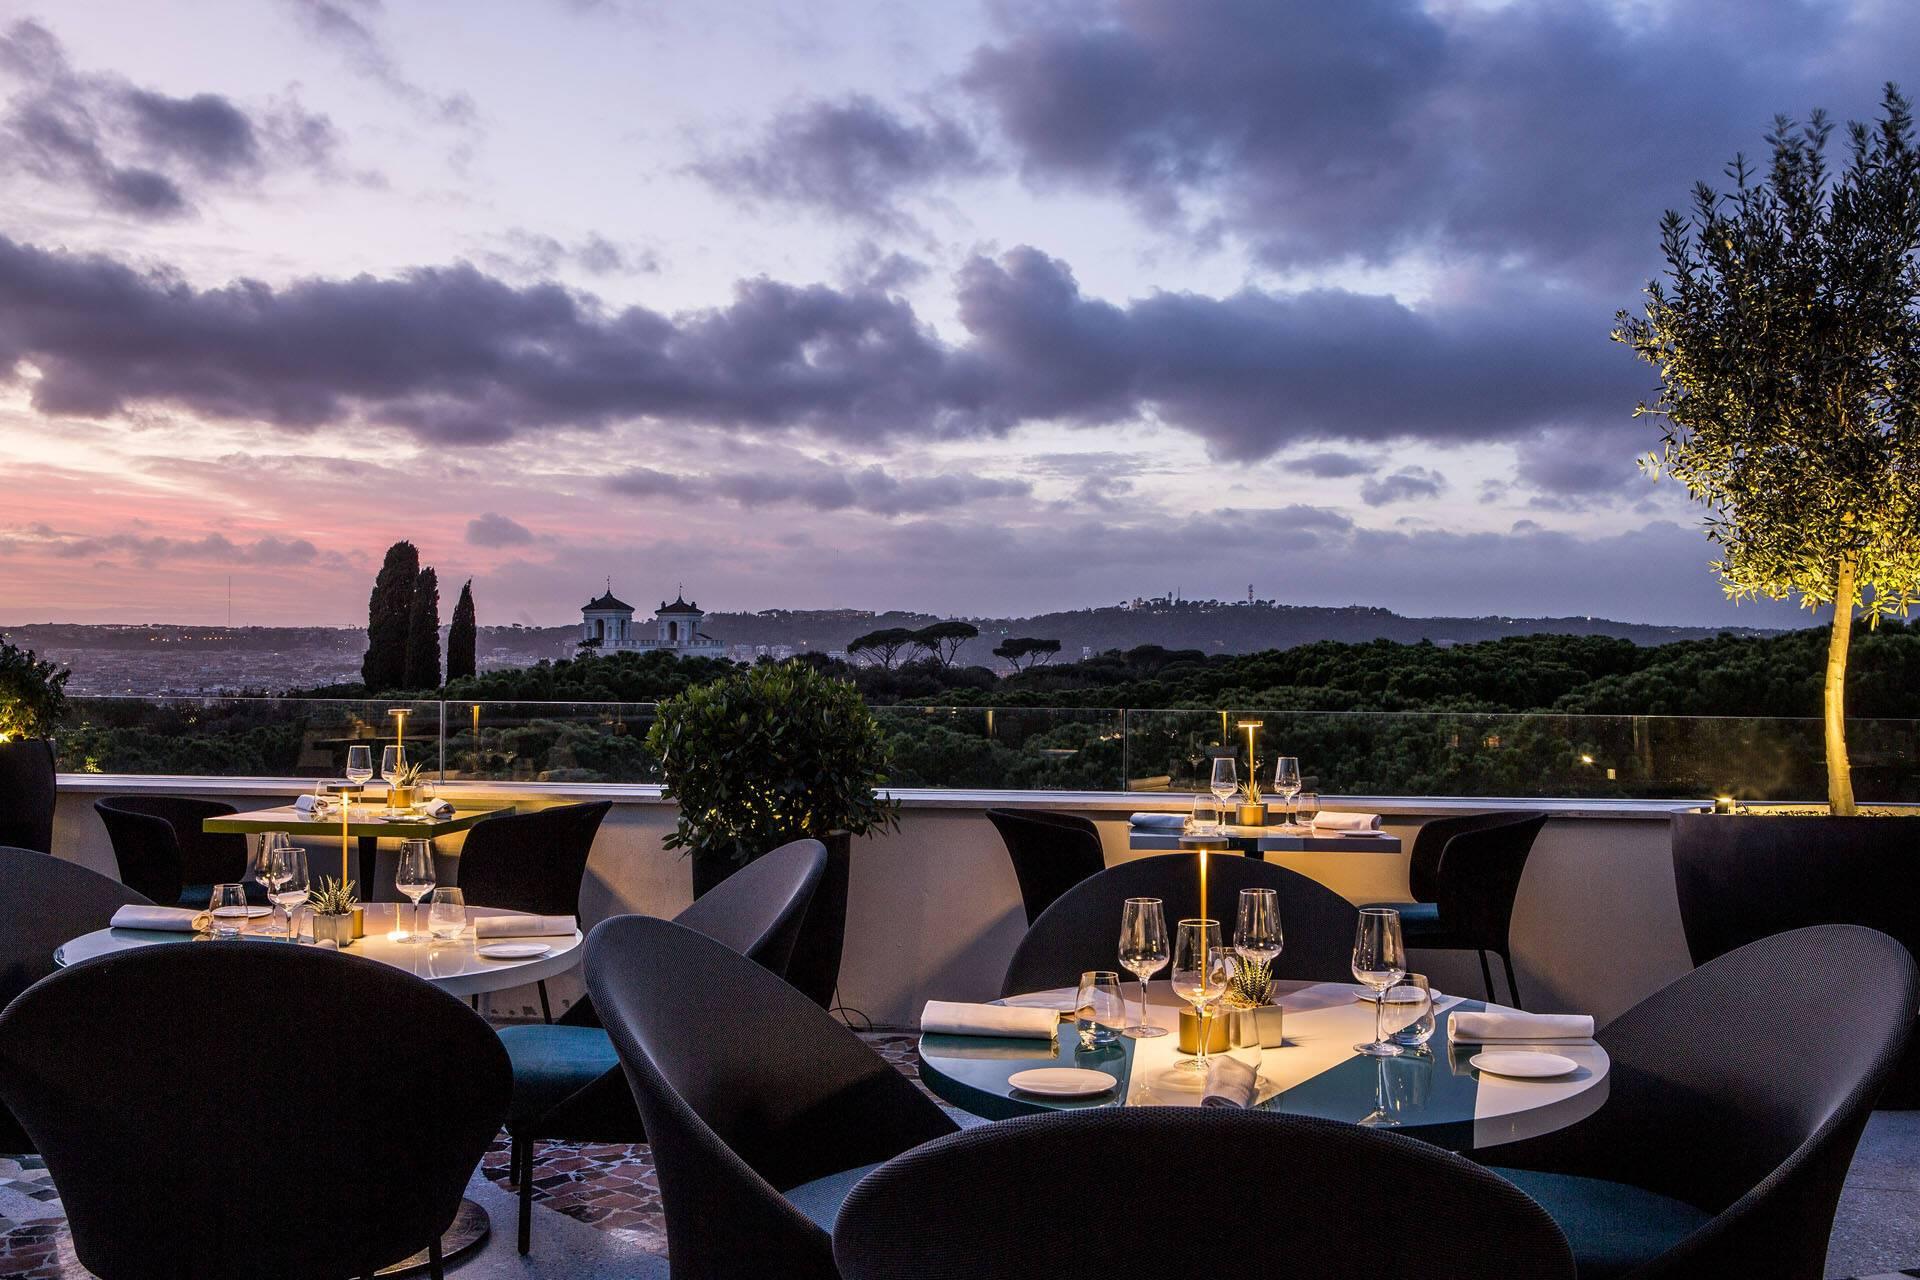 Sofitel Villa Borghese Rome Settimo Restaurant Terrasse Nuit